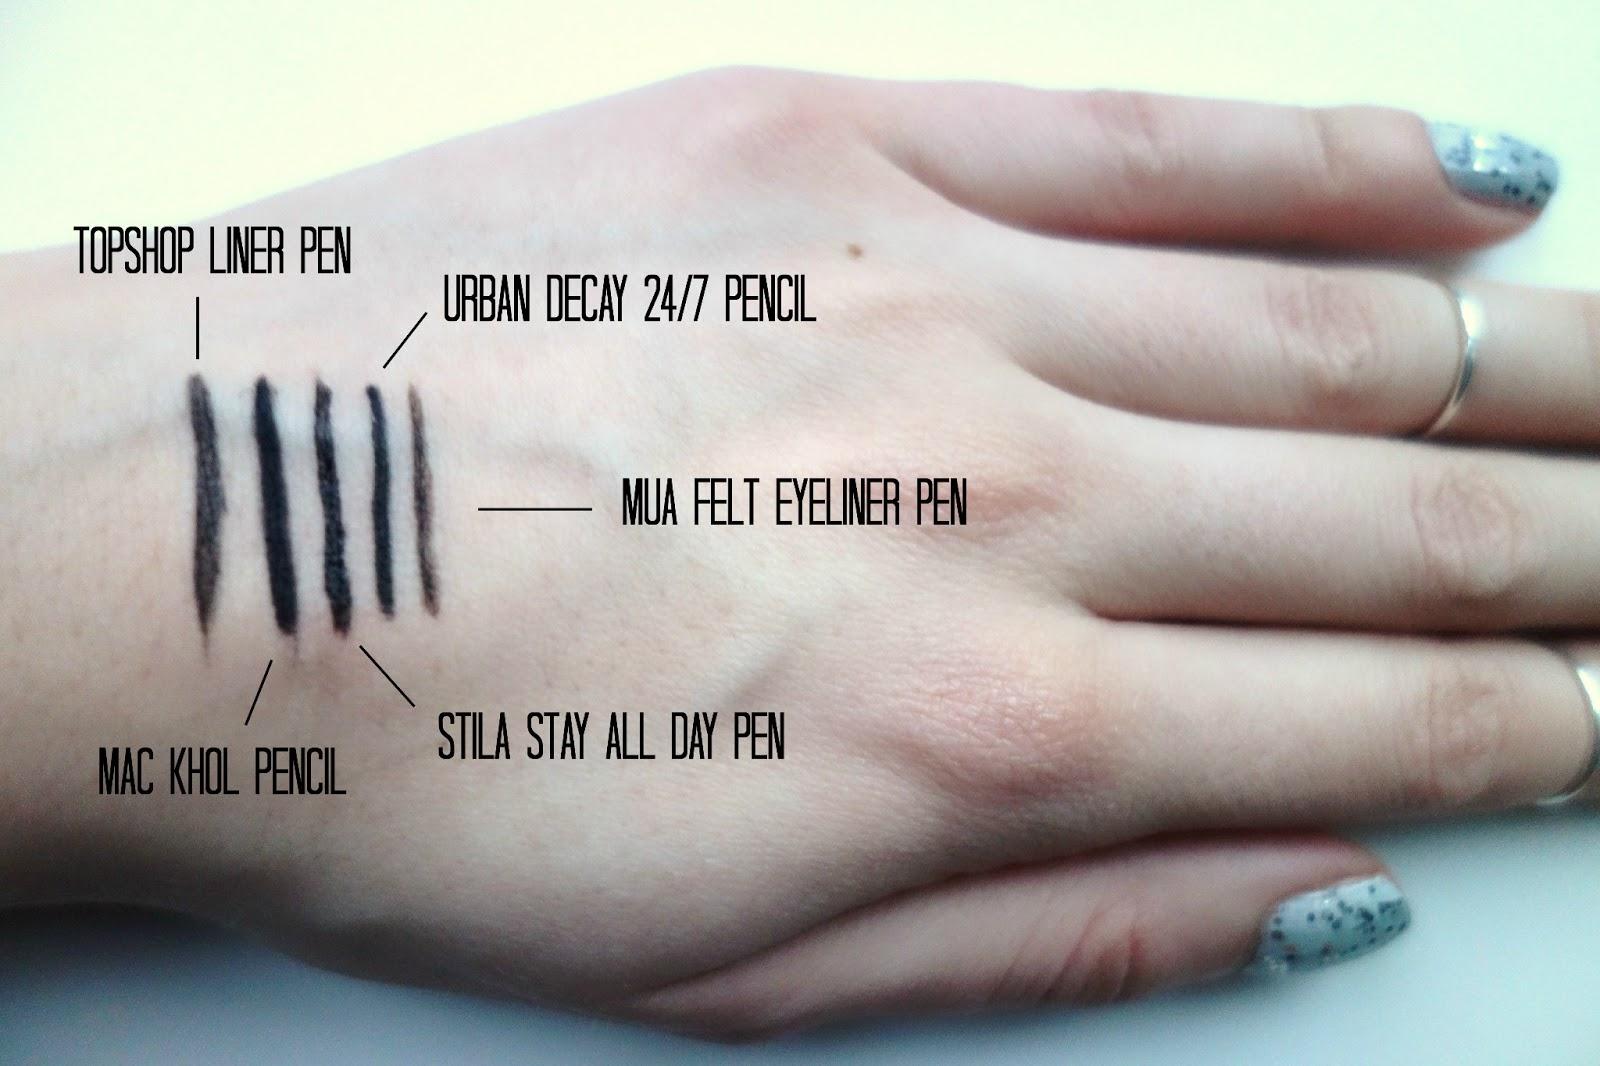 mua felt eyeliner pen, mac khol in smoulder, stila stay all day eyeliner pen, urban decay 24/7 pencil, topshop eyeliner